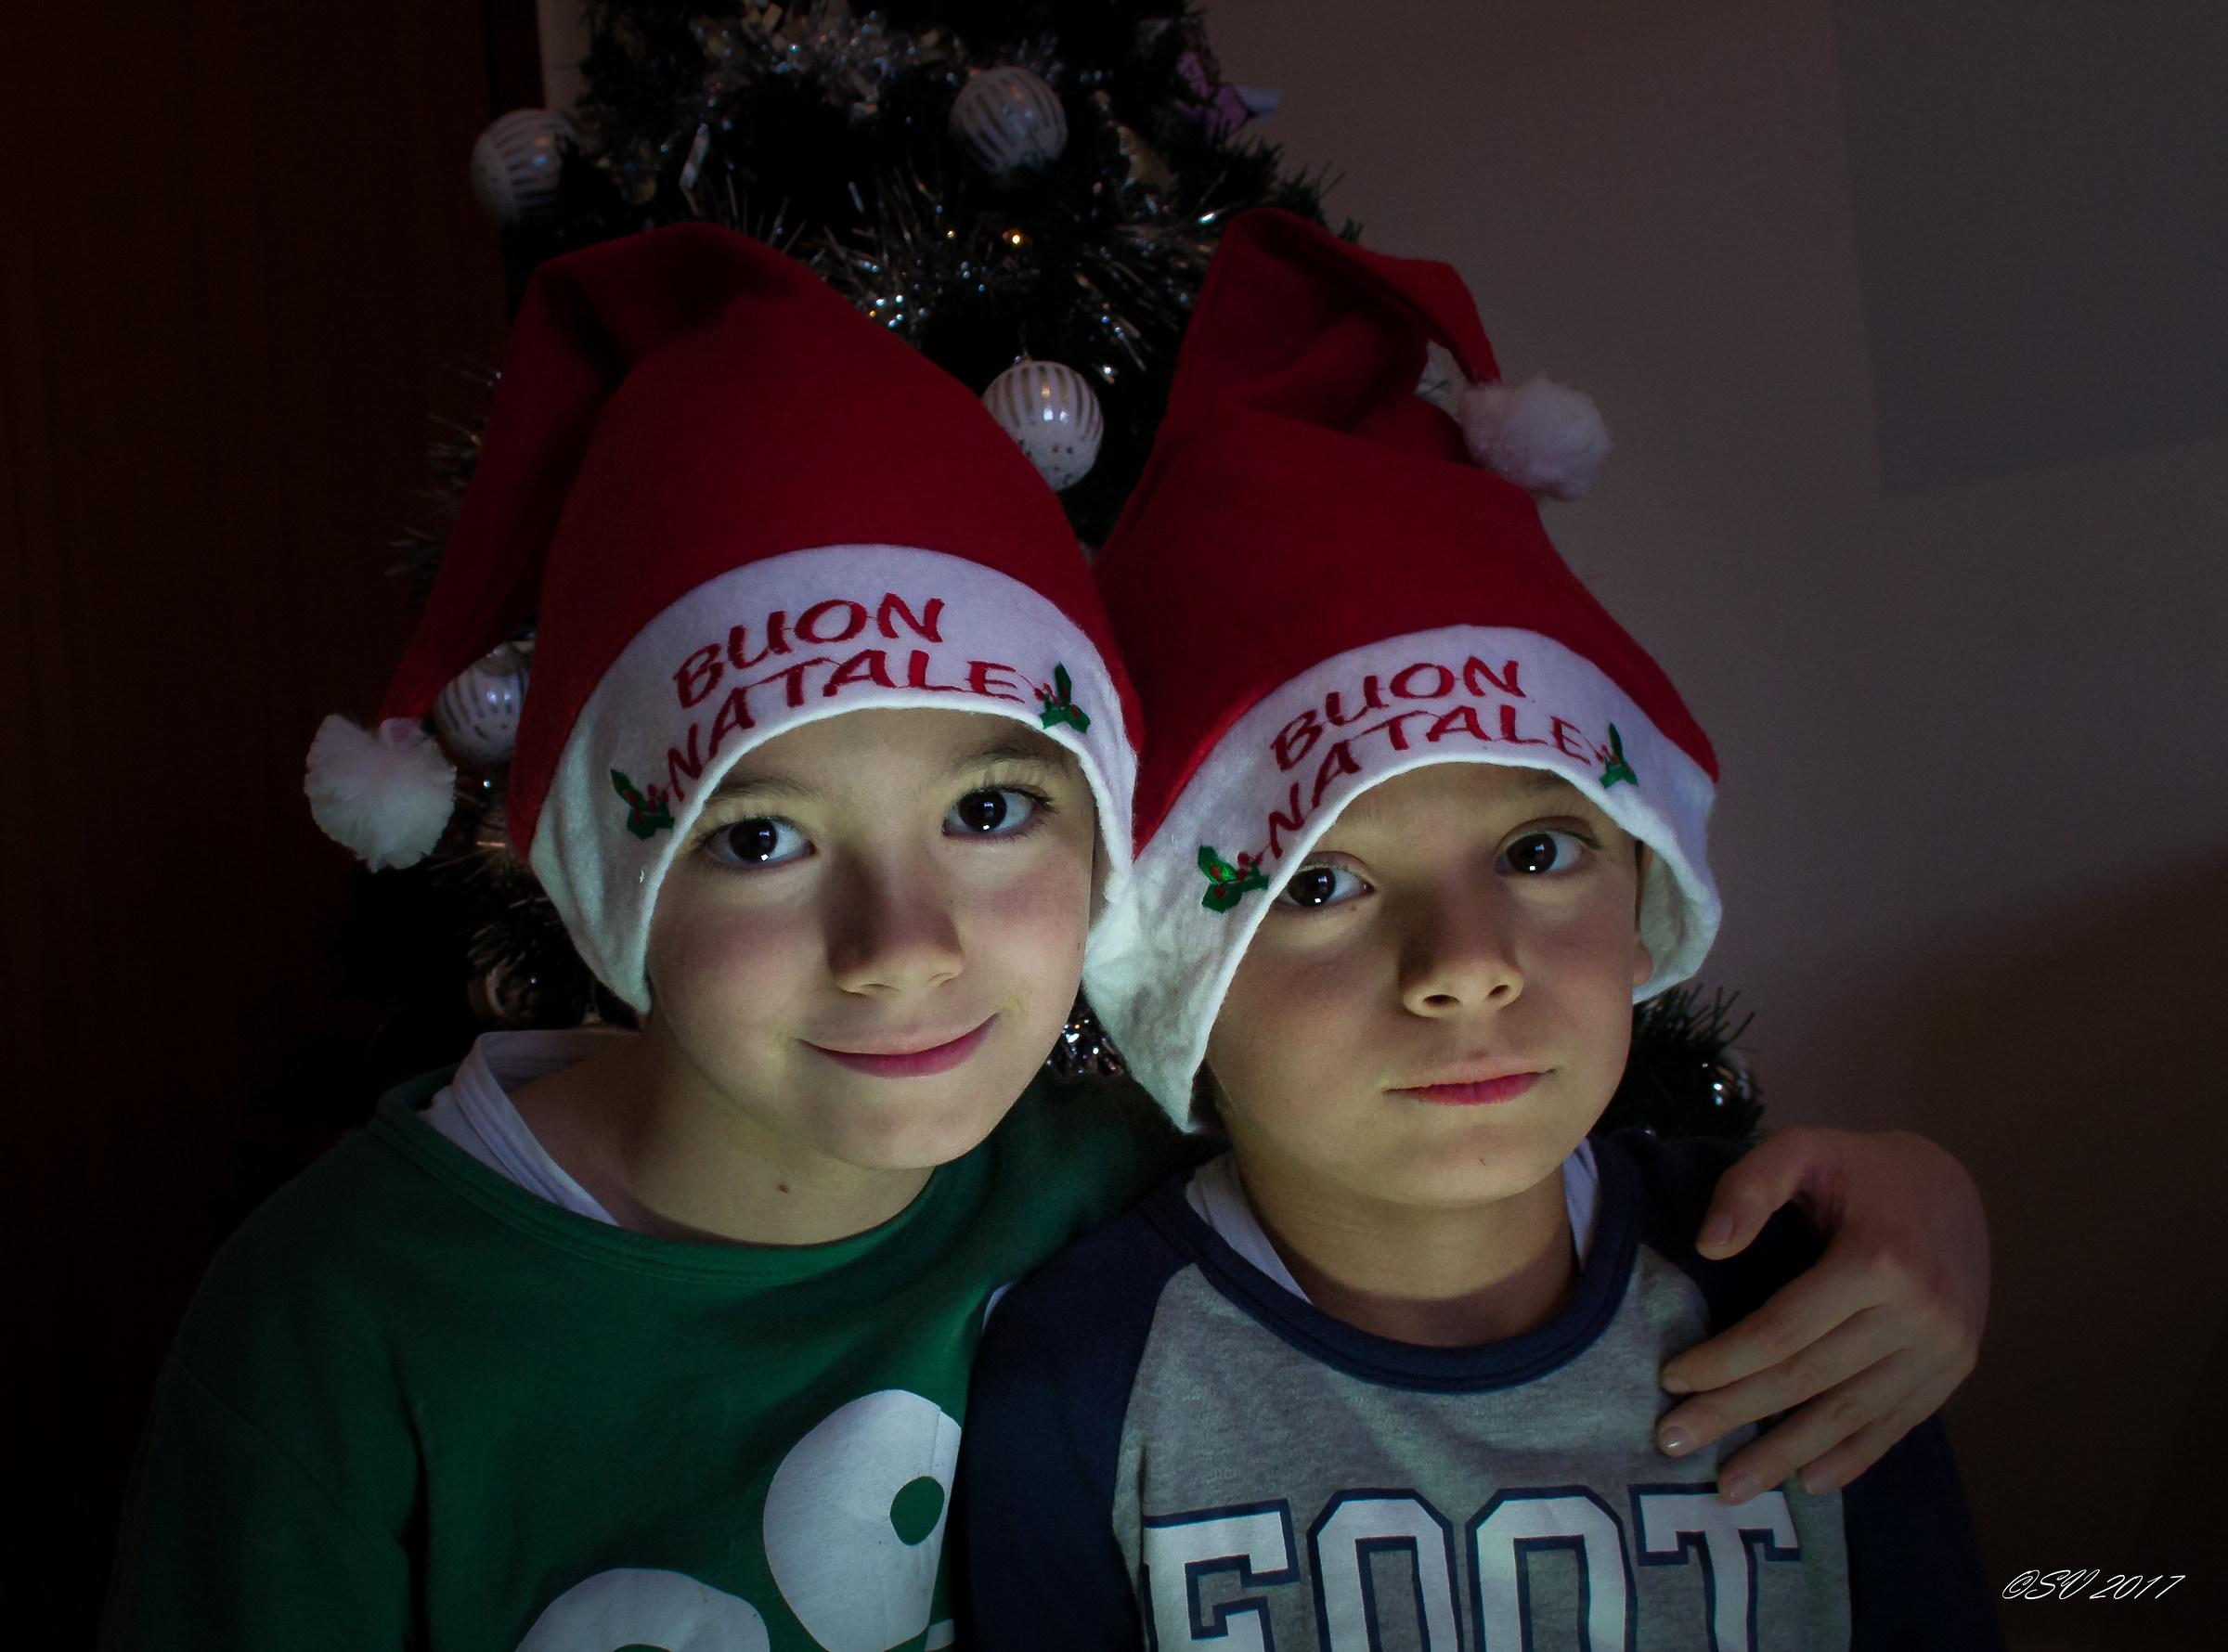 Daniele and Leonardo ... my most beautiful gifts...